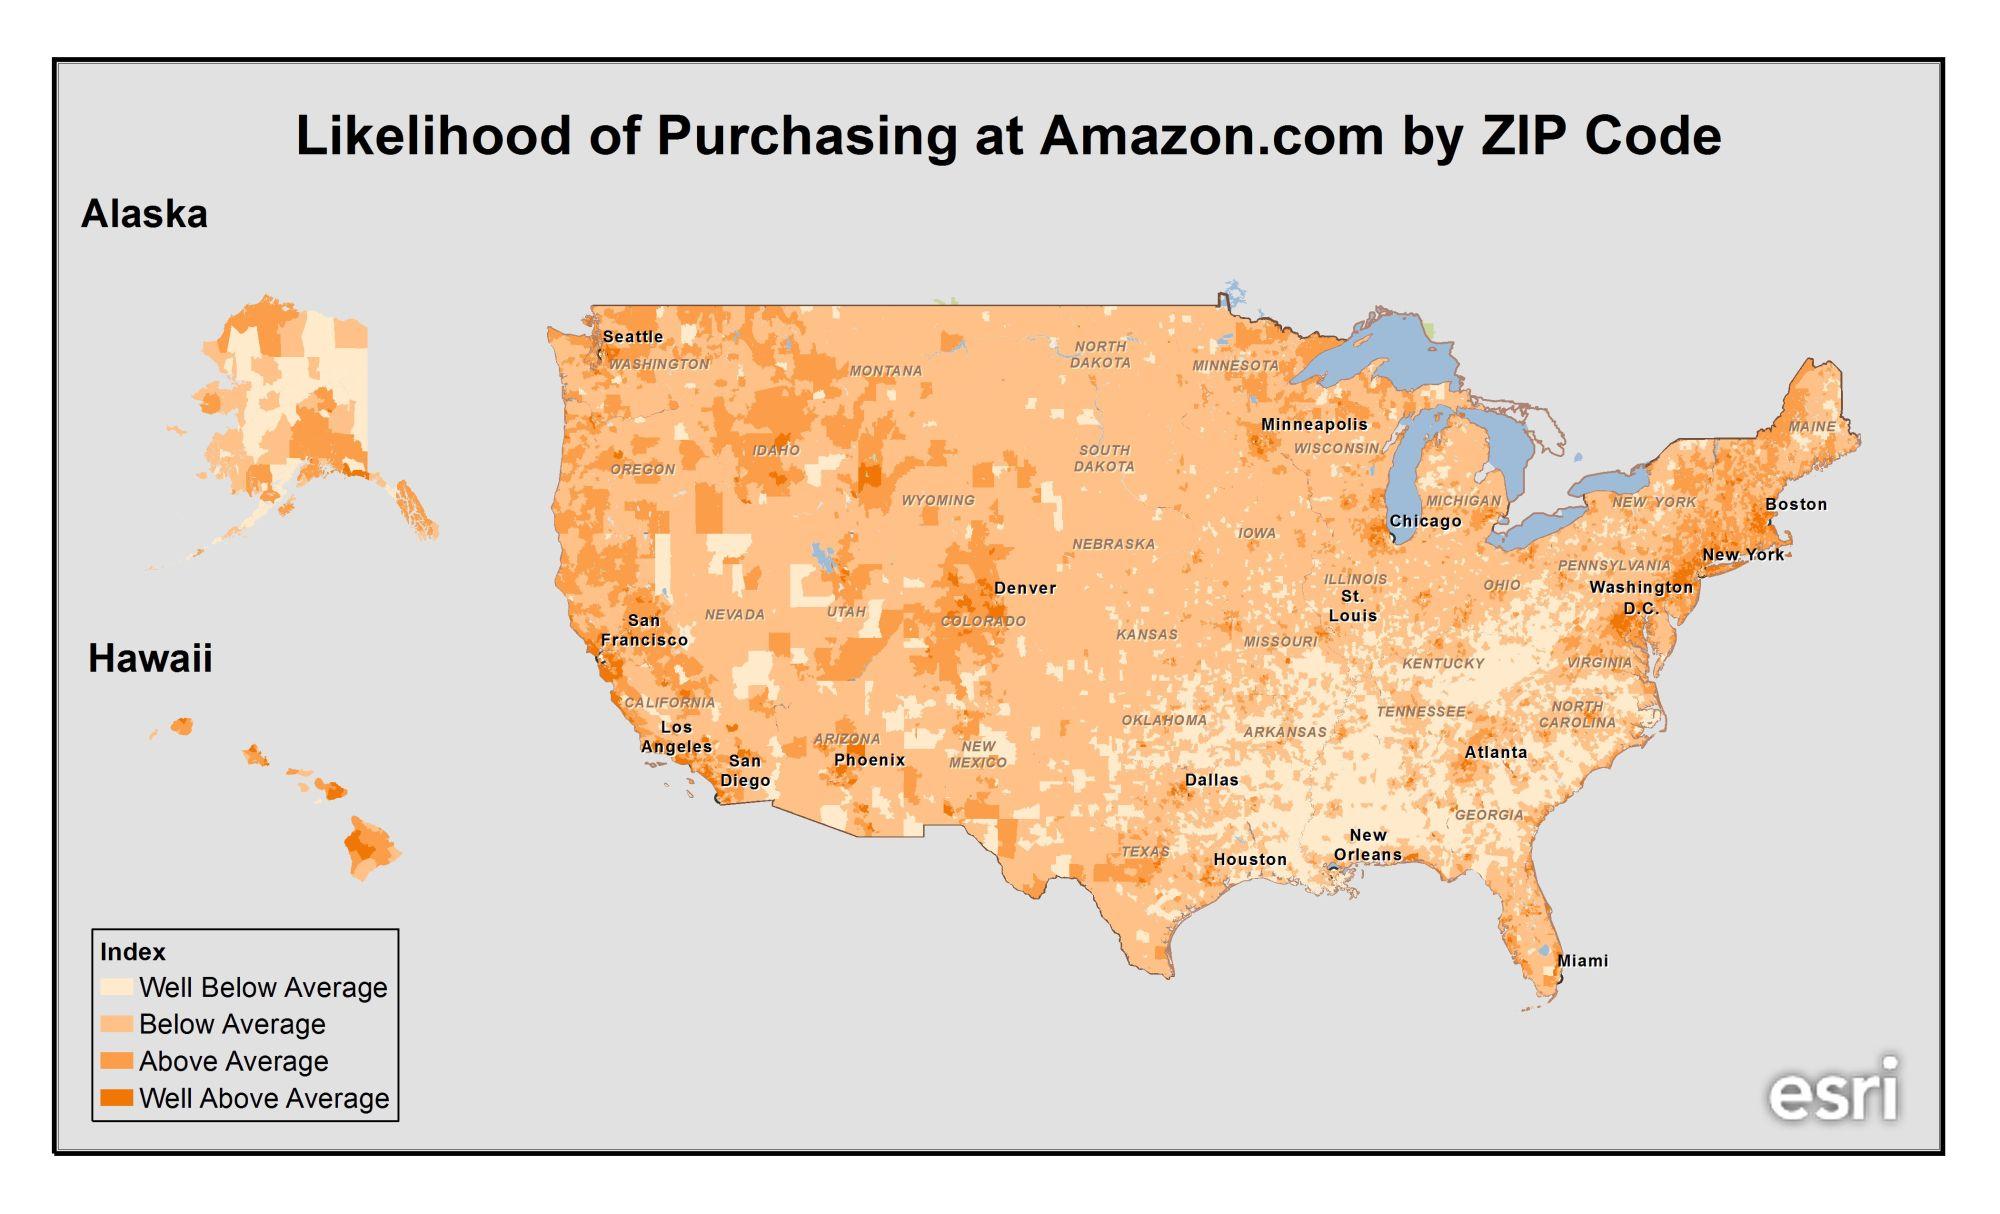 Amazon.com Customers By Zip Code [MAP]